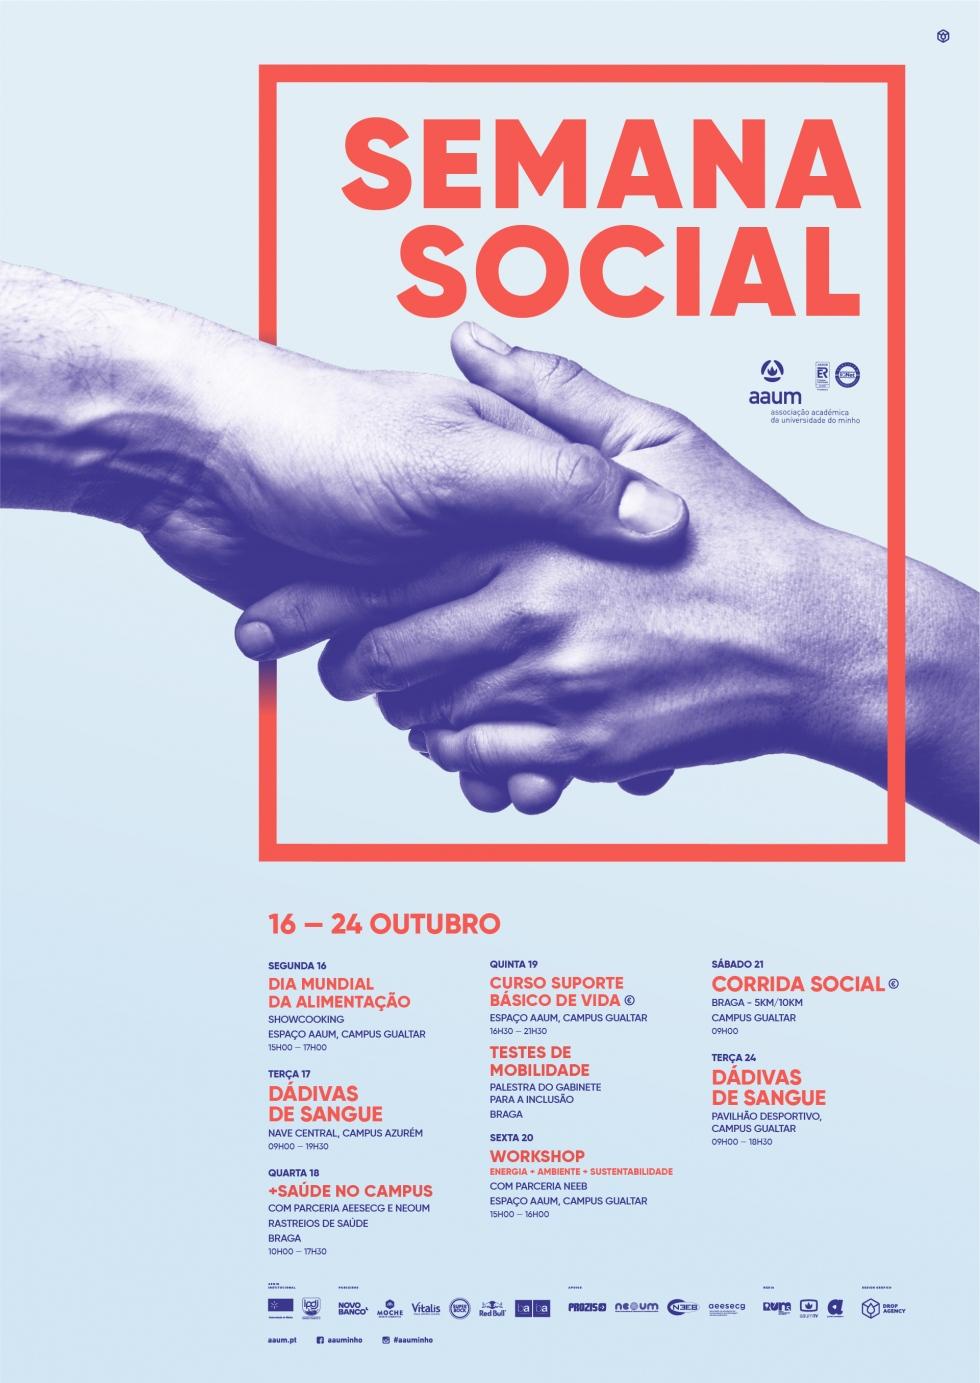 Semana Social : AAUM